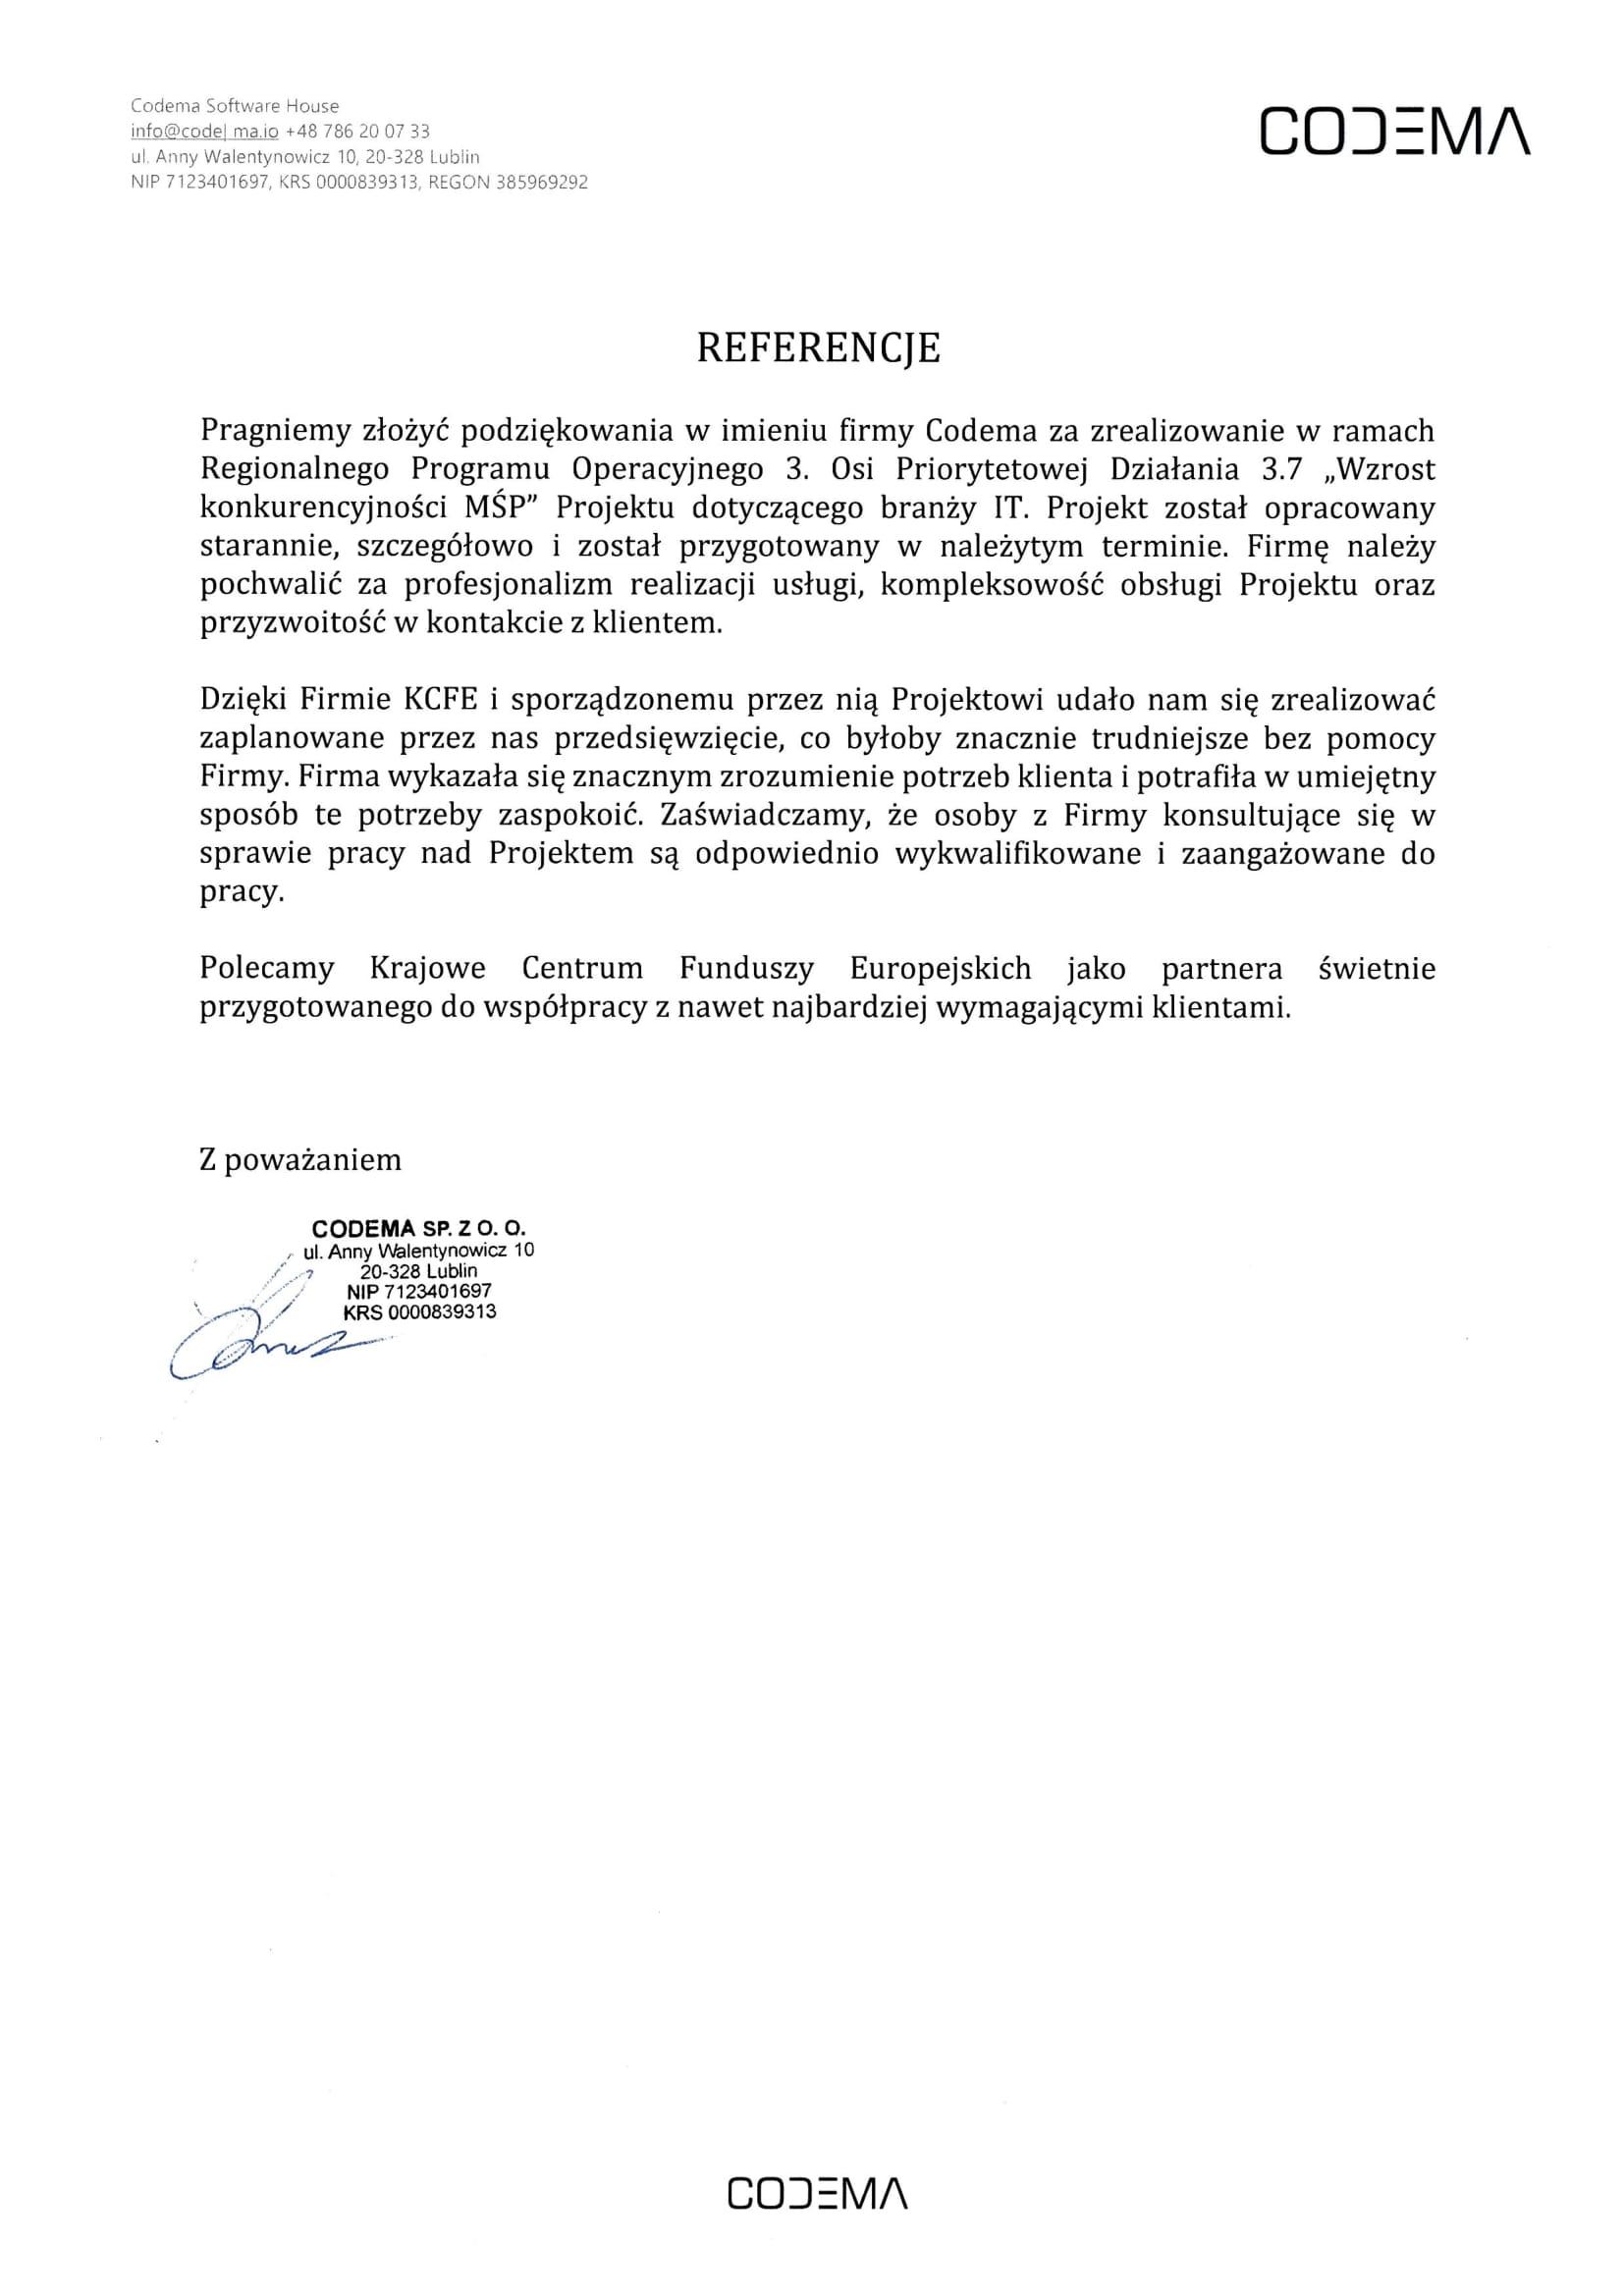 Referencje CODEMA - JPG